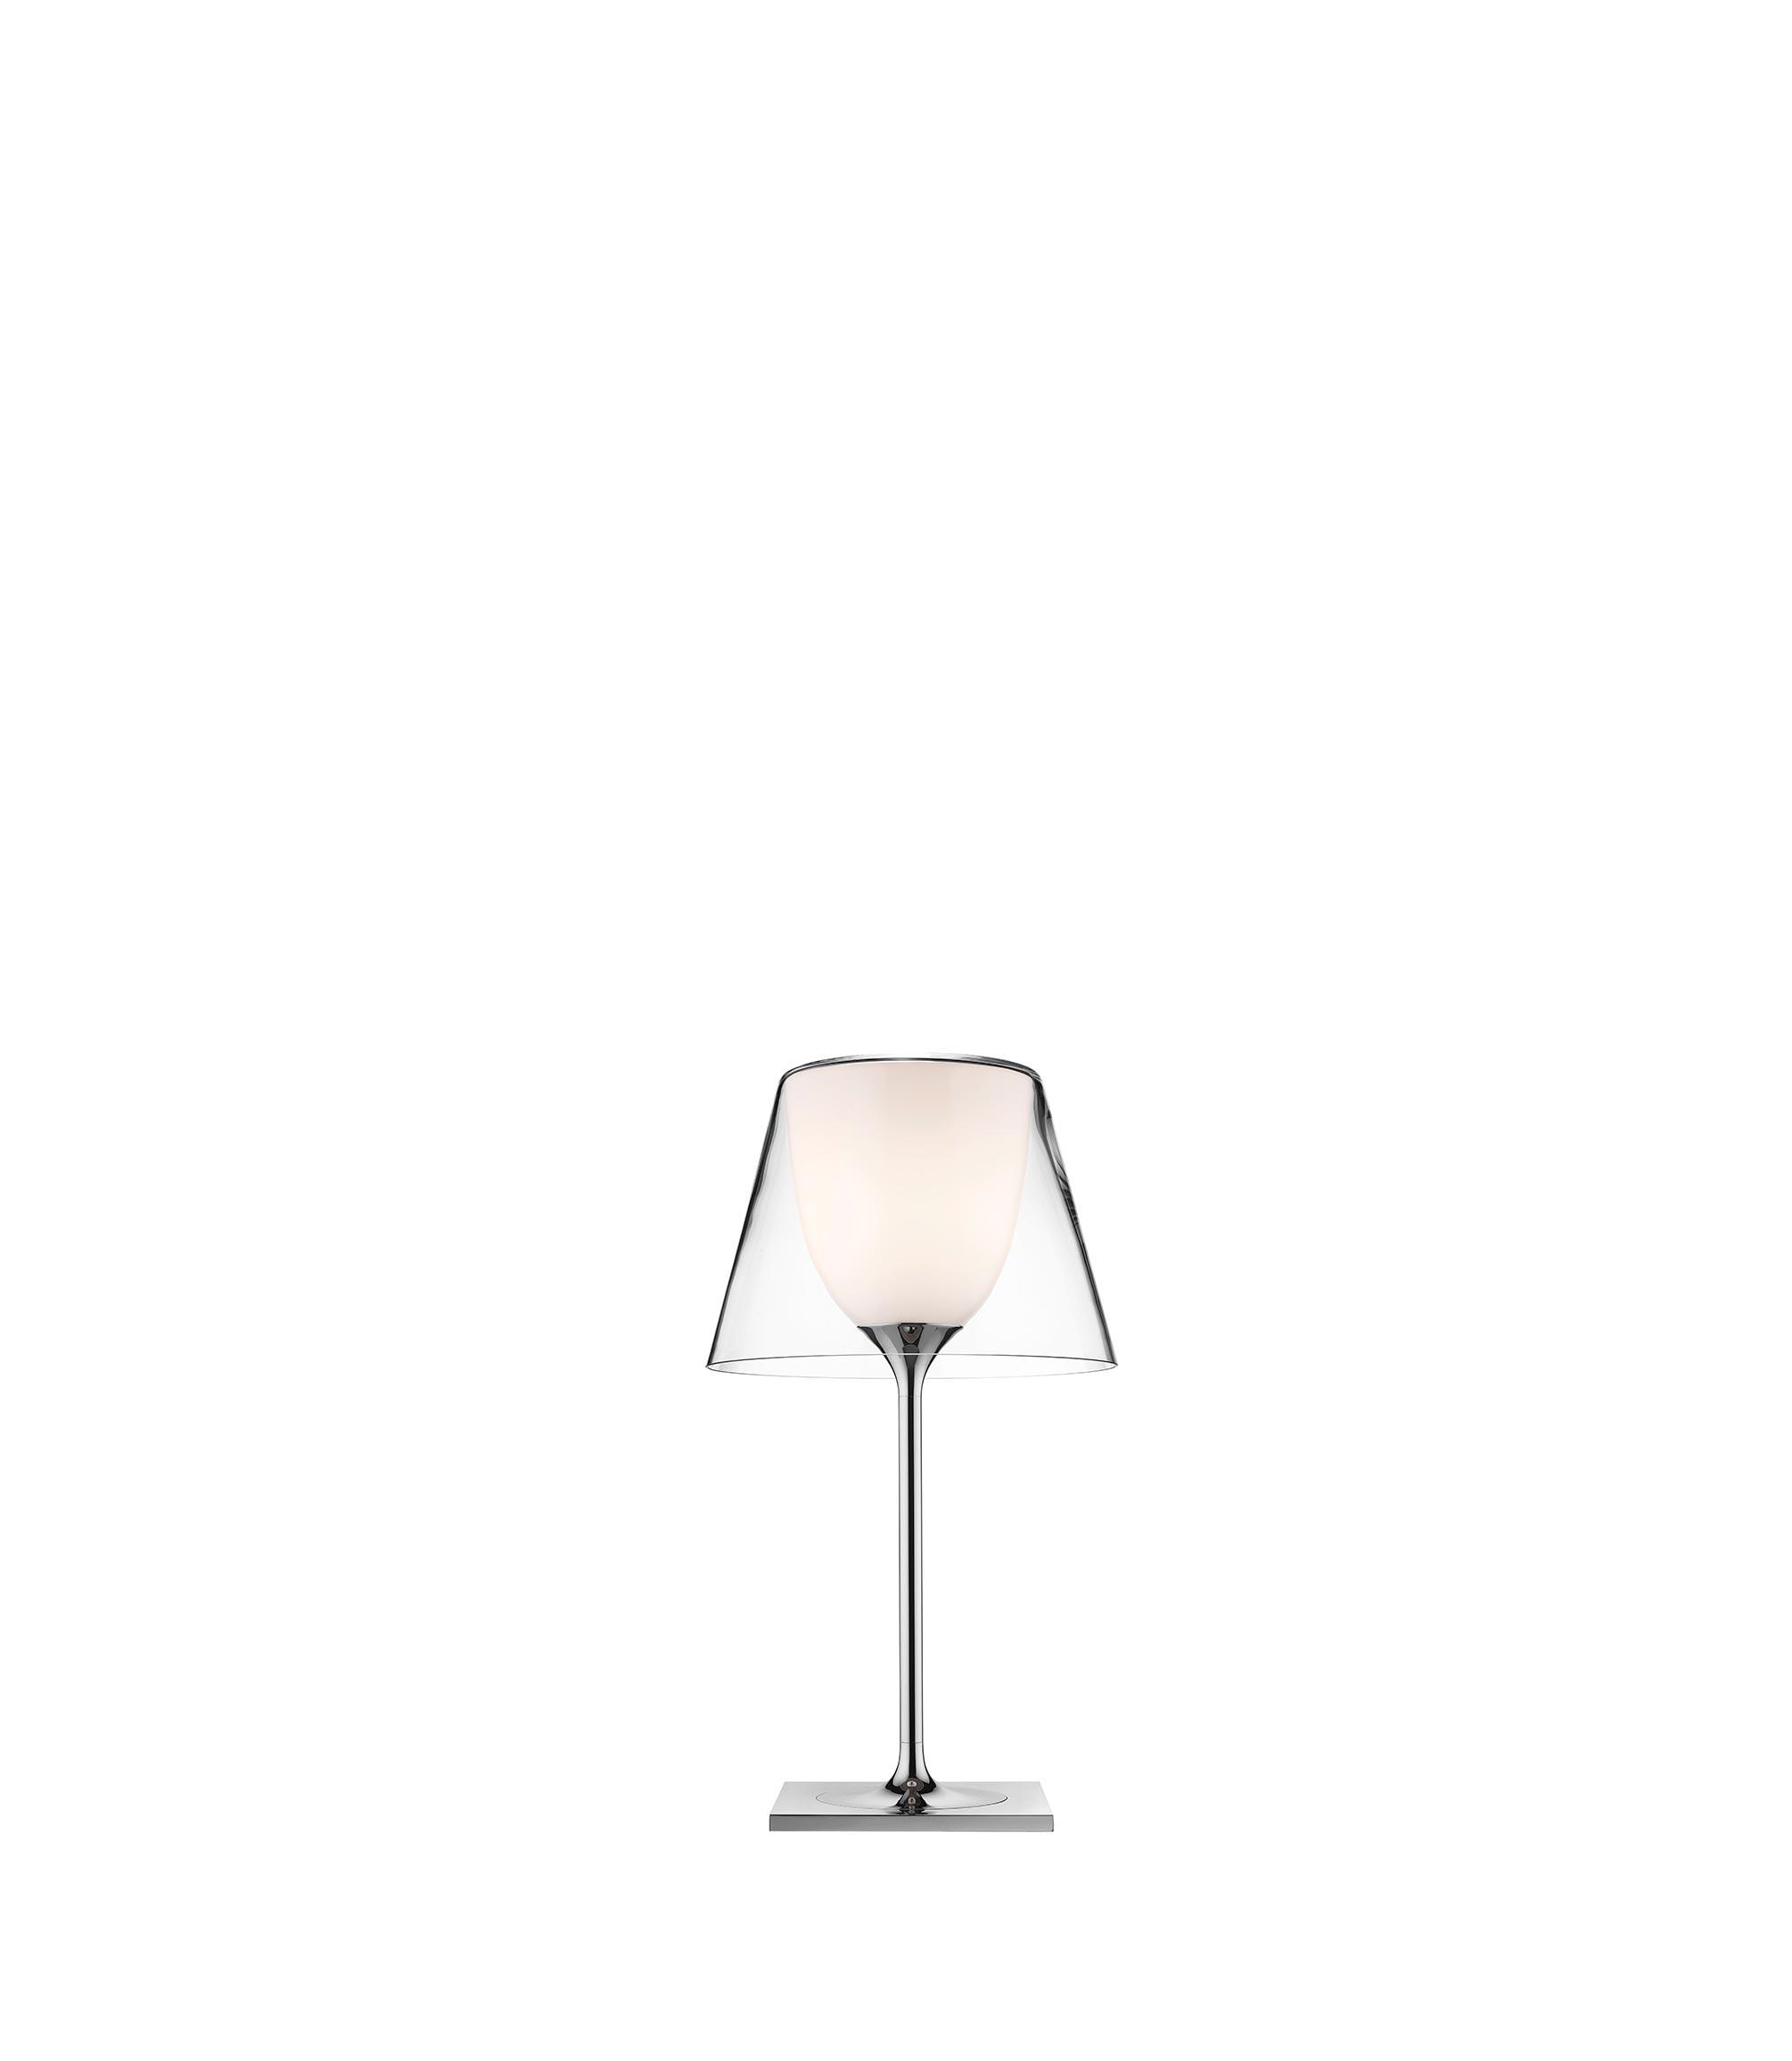 Ktribe table 1 glass starck flos F6281000 product still life big 1